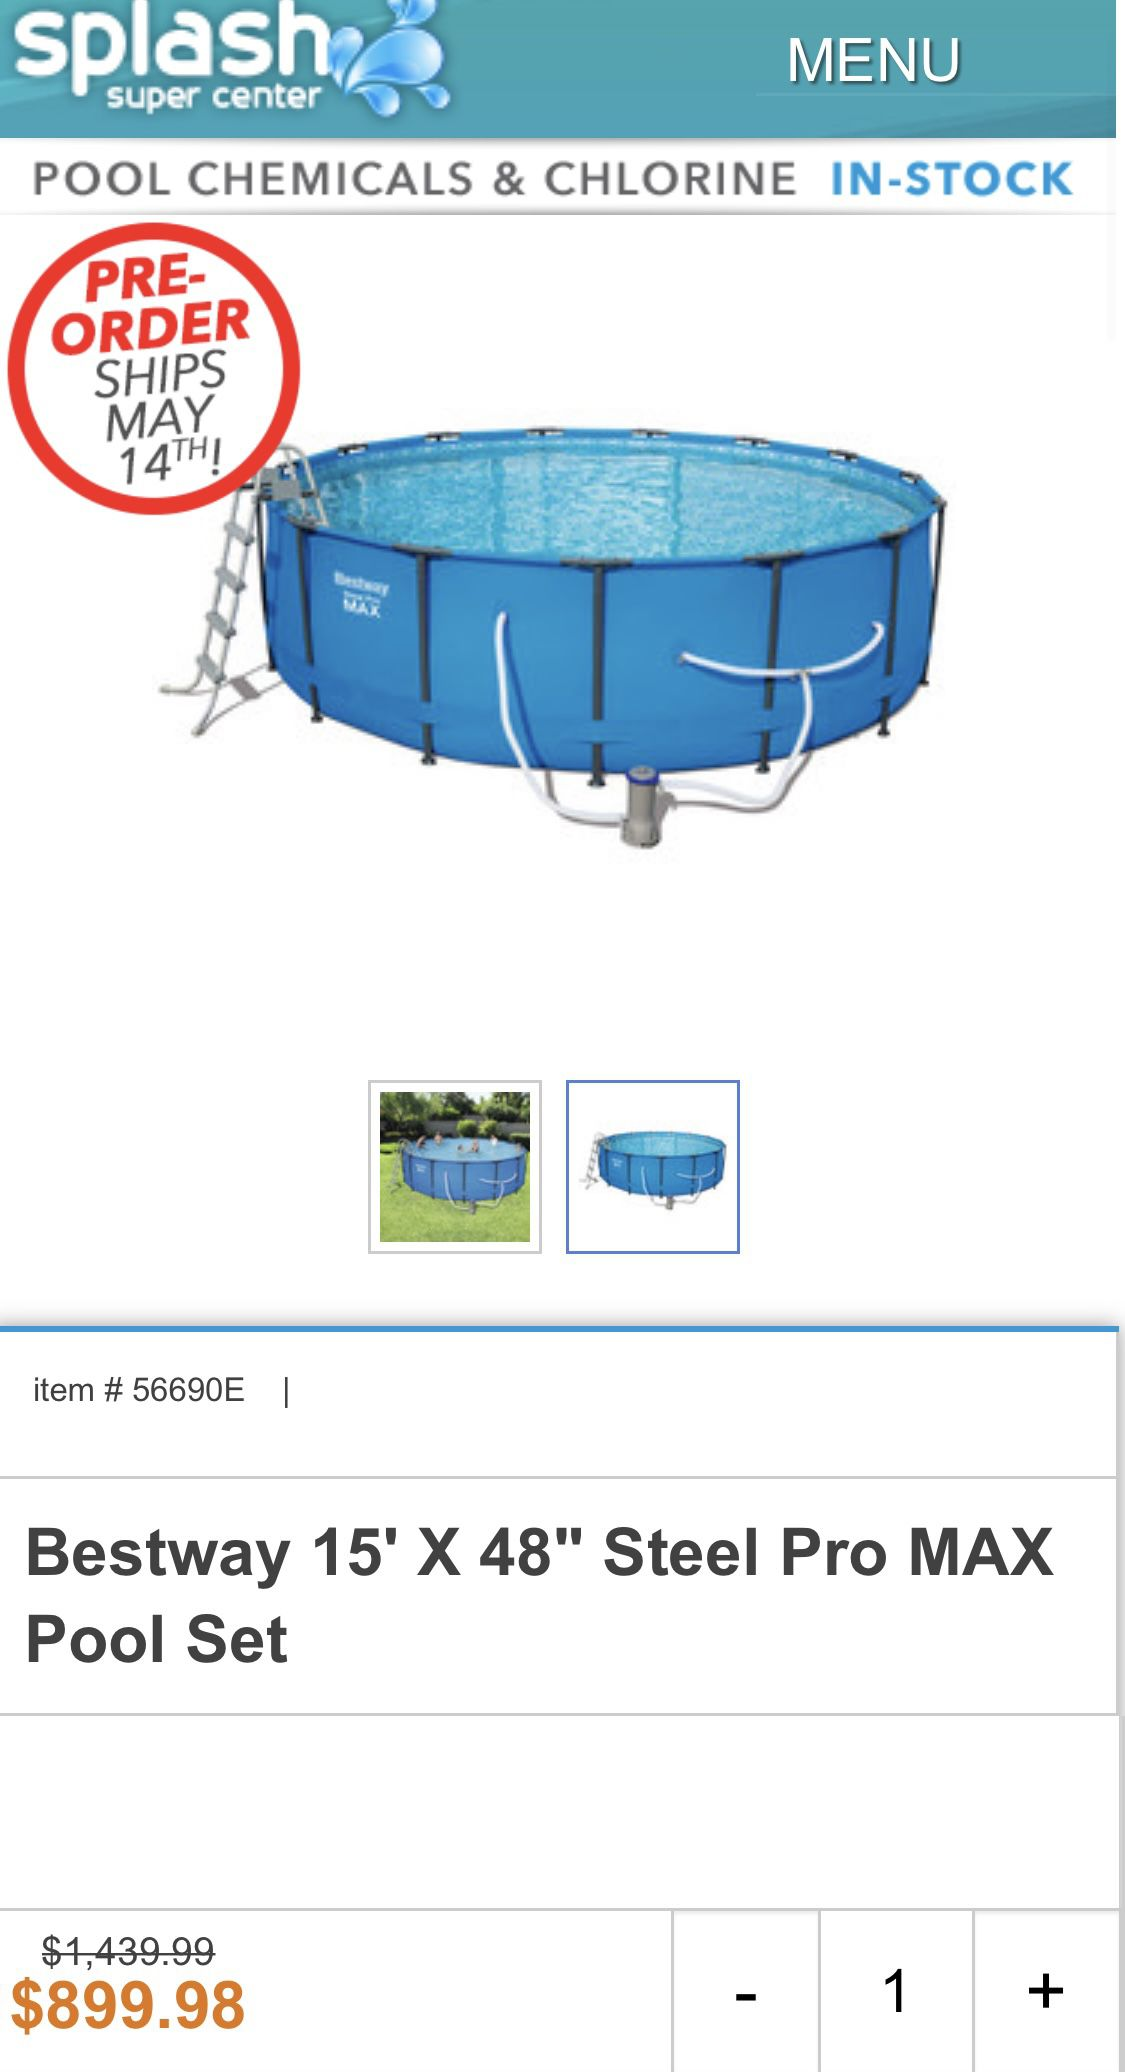 "Bestway Steel Pro Max Swimming Pool w 1000GPH Filter, 15x48"" Round"